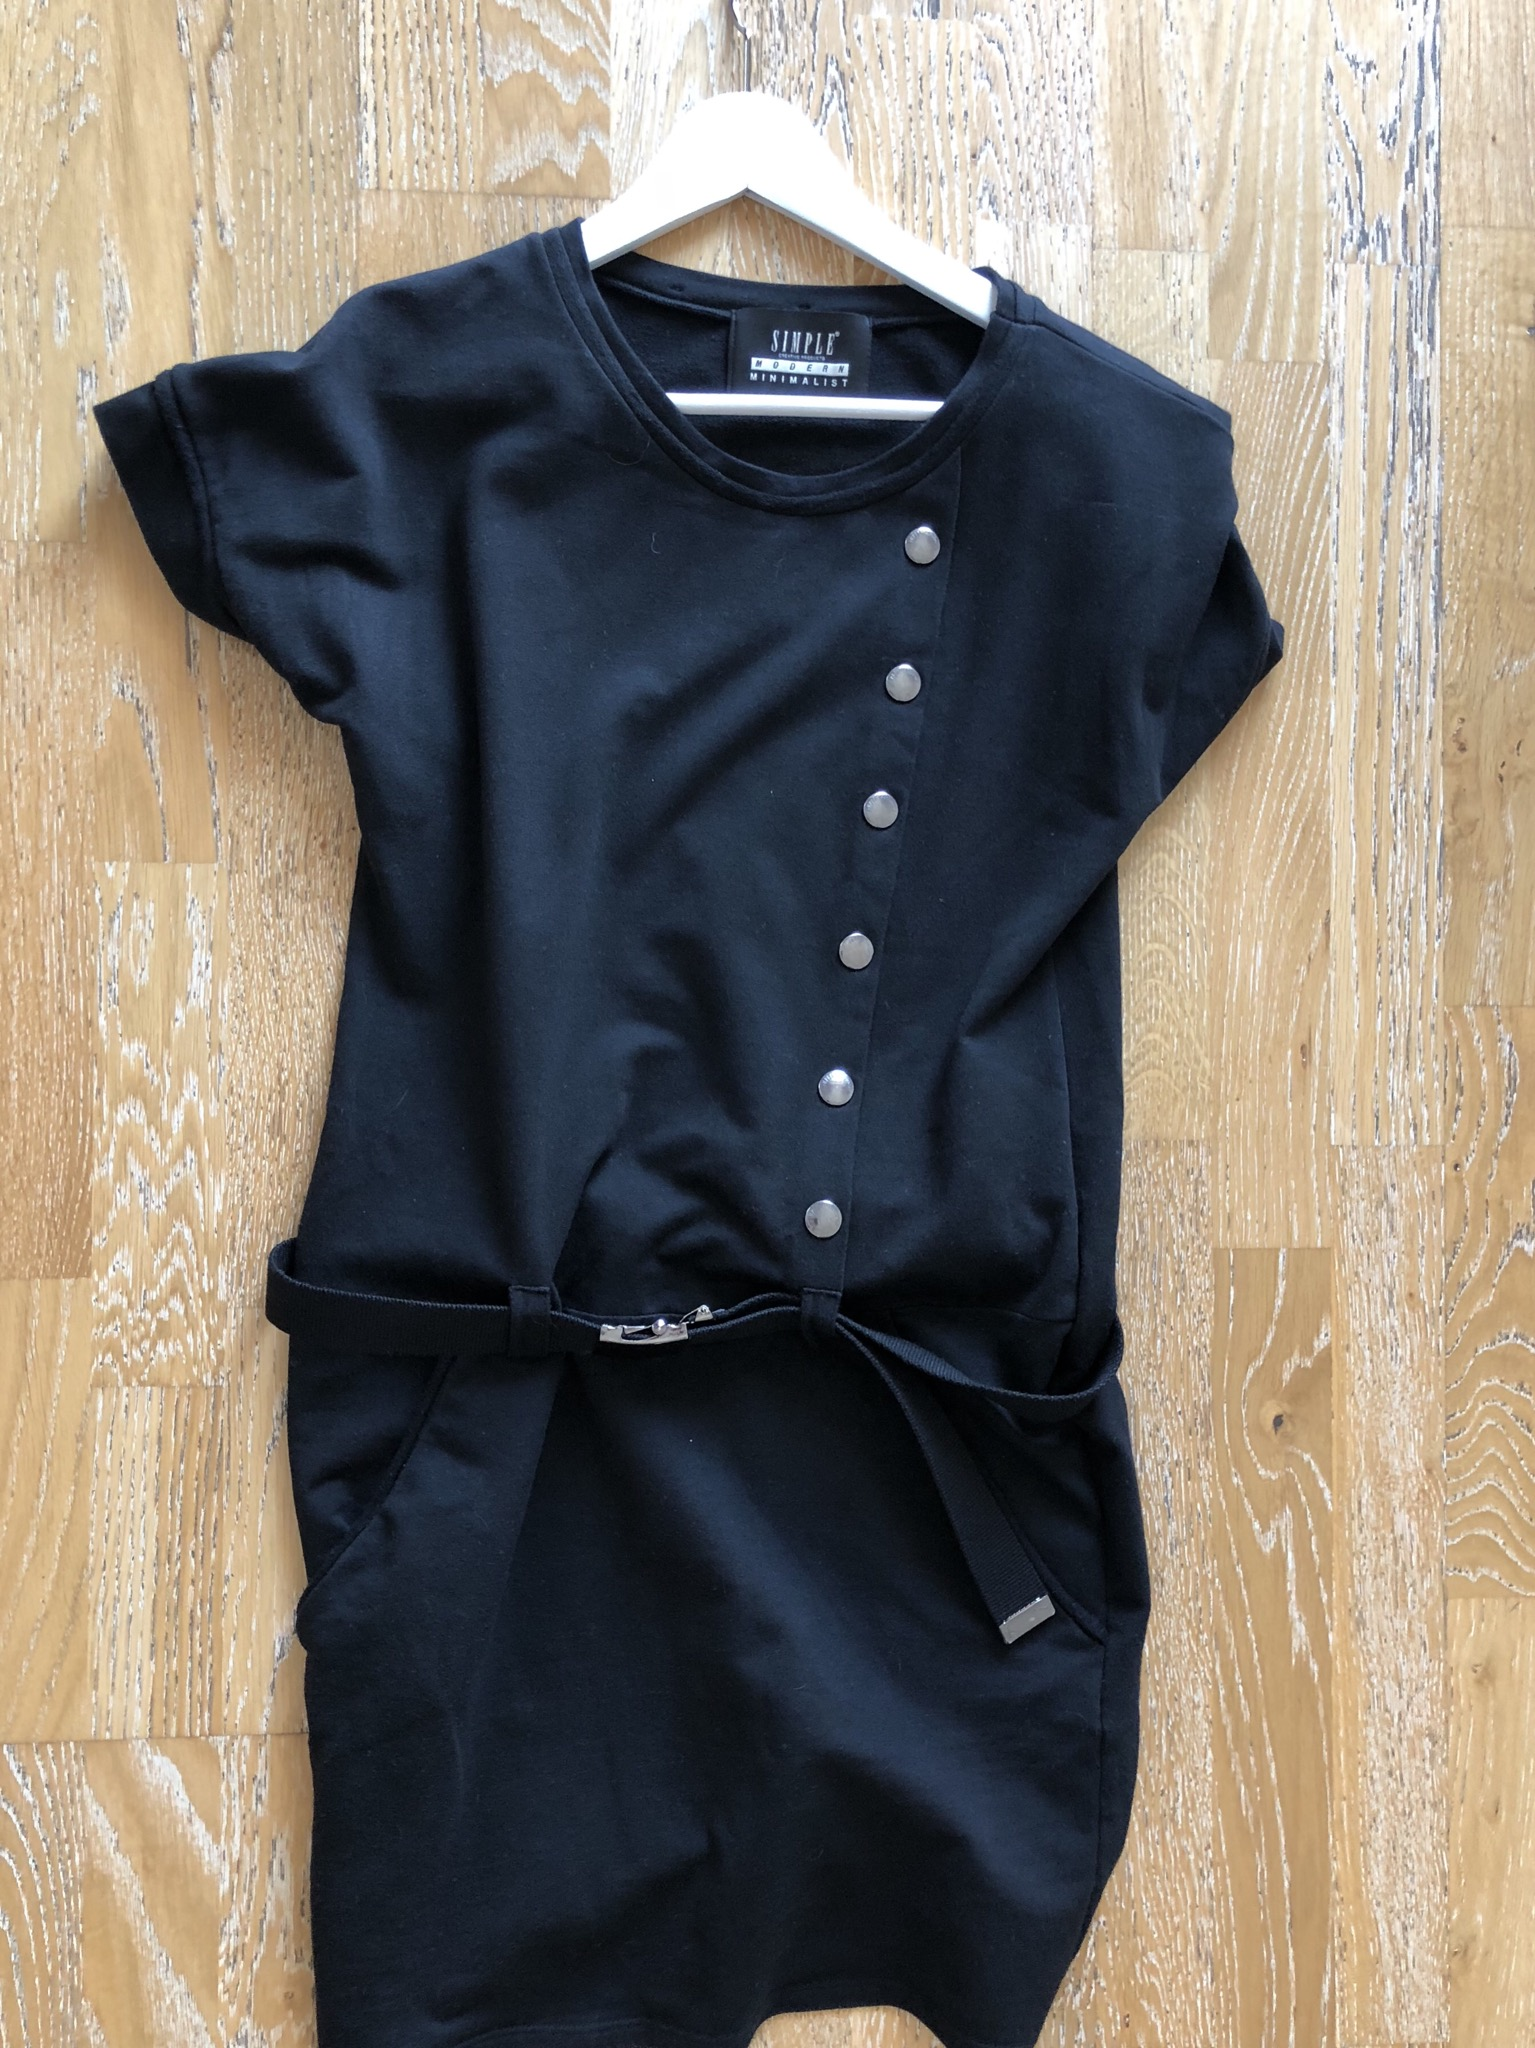 94506cacc4 Simple sukienka czarna M - 7305072173 - oficjalne archiwum allegro